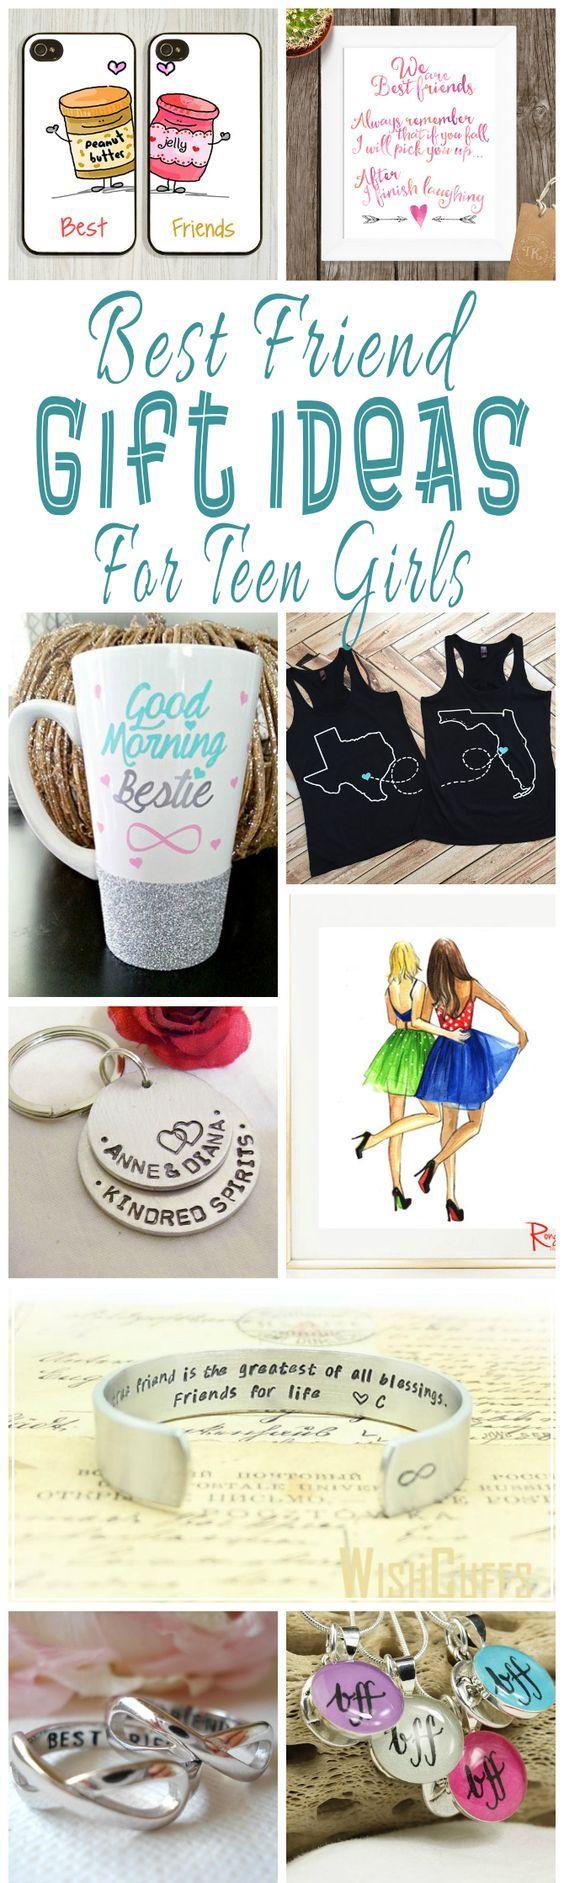 best Easy Diy images on Pinterest  Creative ideas Creativity